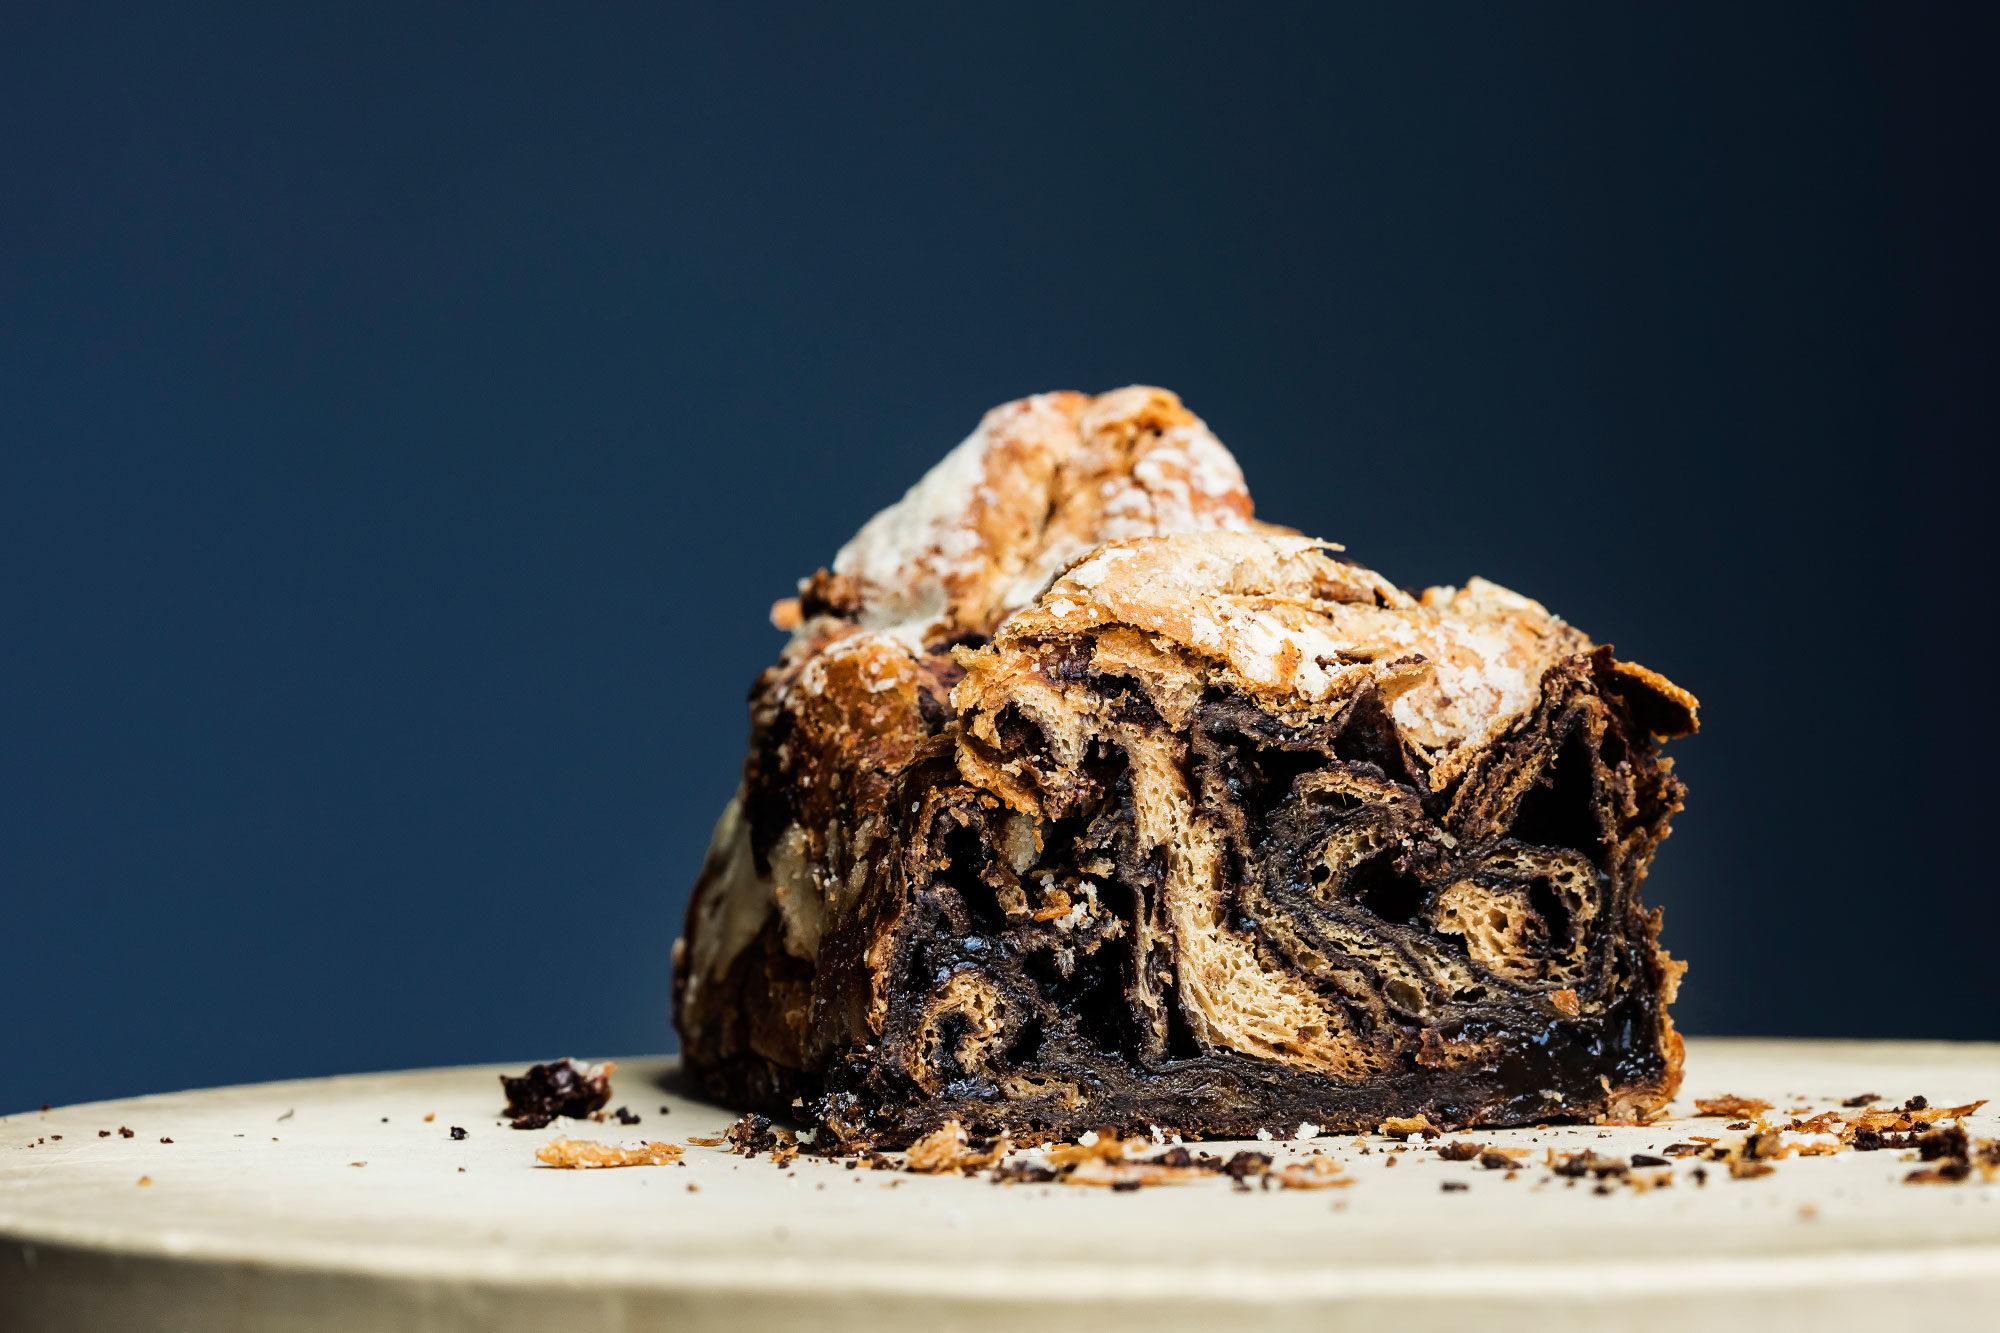 Article-How-to-Use-Sourdough-Bread-Starter-Baking-Babka-Recipe-Pancakes